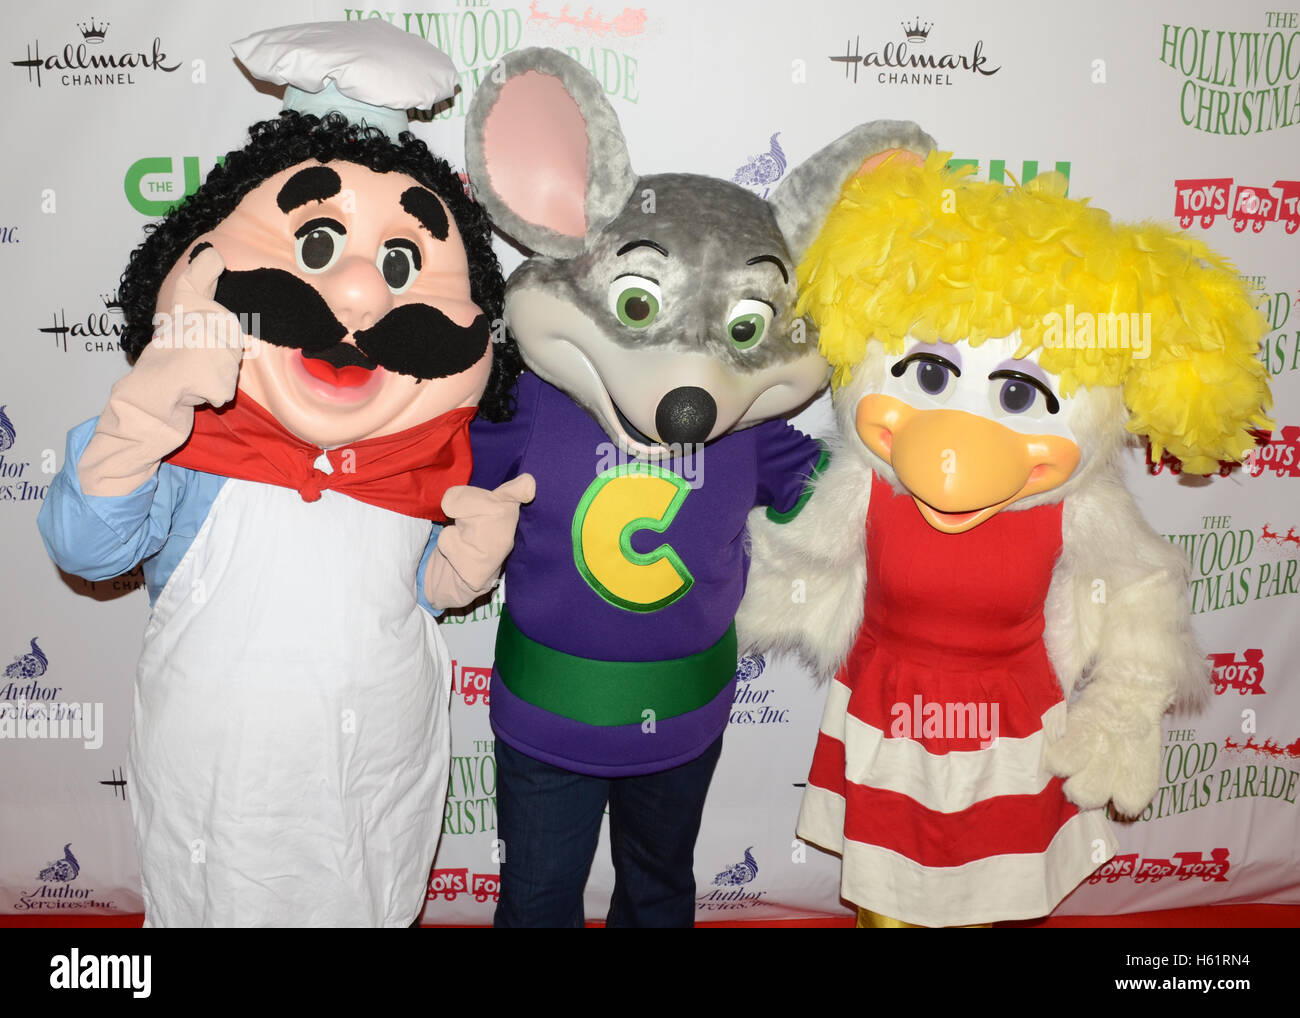 Chuck E Cheese Christmas.Pasqually The Chef Chuck E Cheese And Helen Henny Arrives